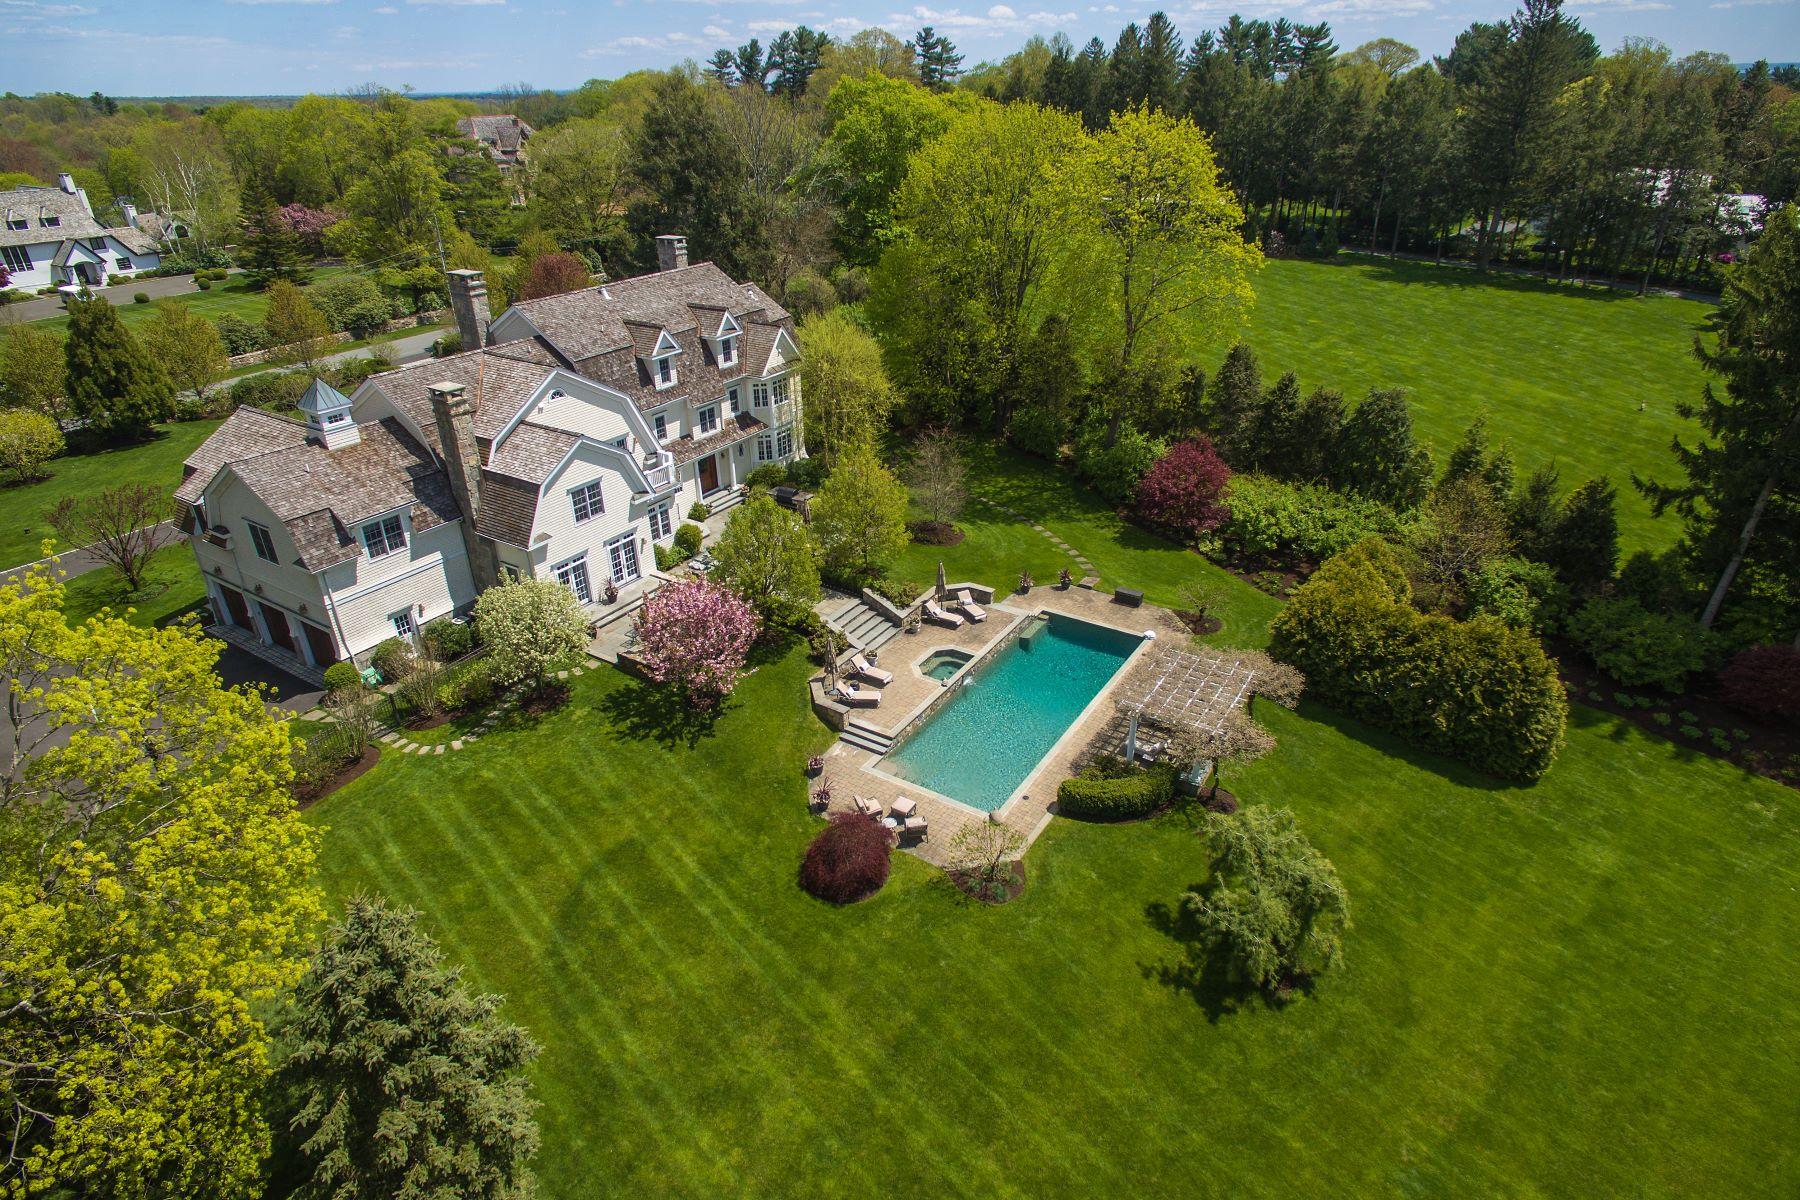 Single Family Homes για την Πώληση στο New Canaan, Κονεκτικατ 06840 Ηνωμένες Πολιτείες